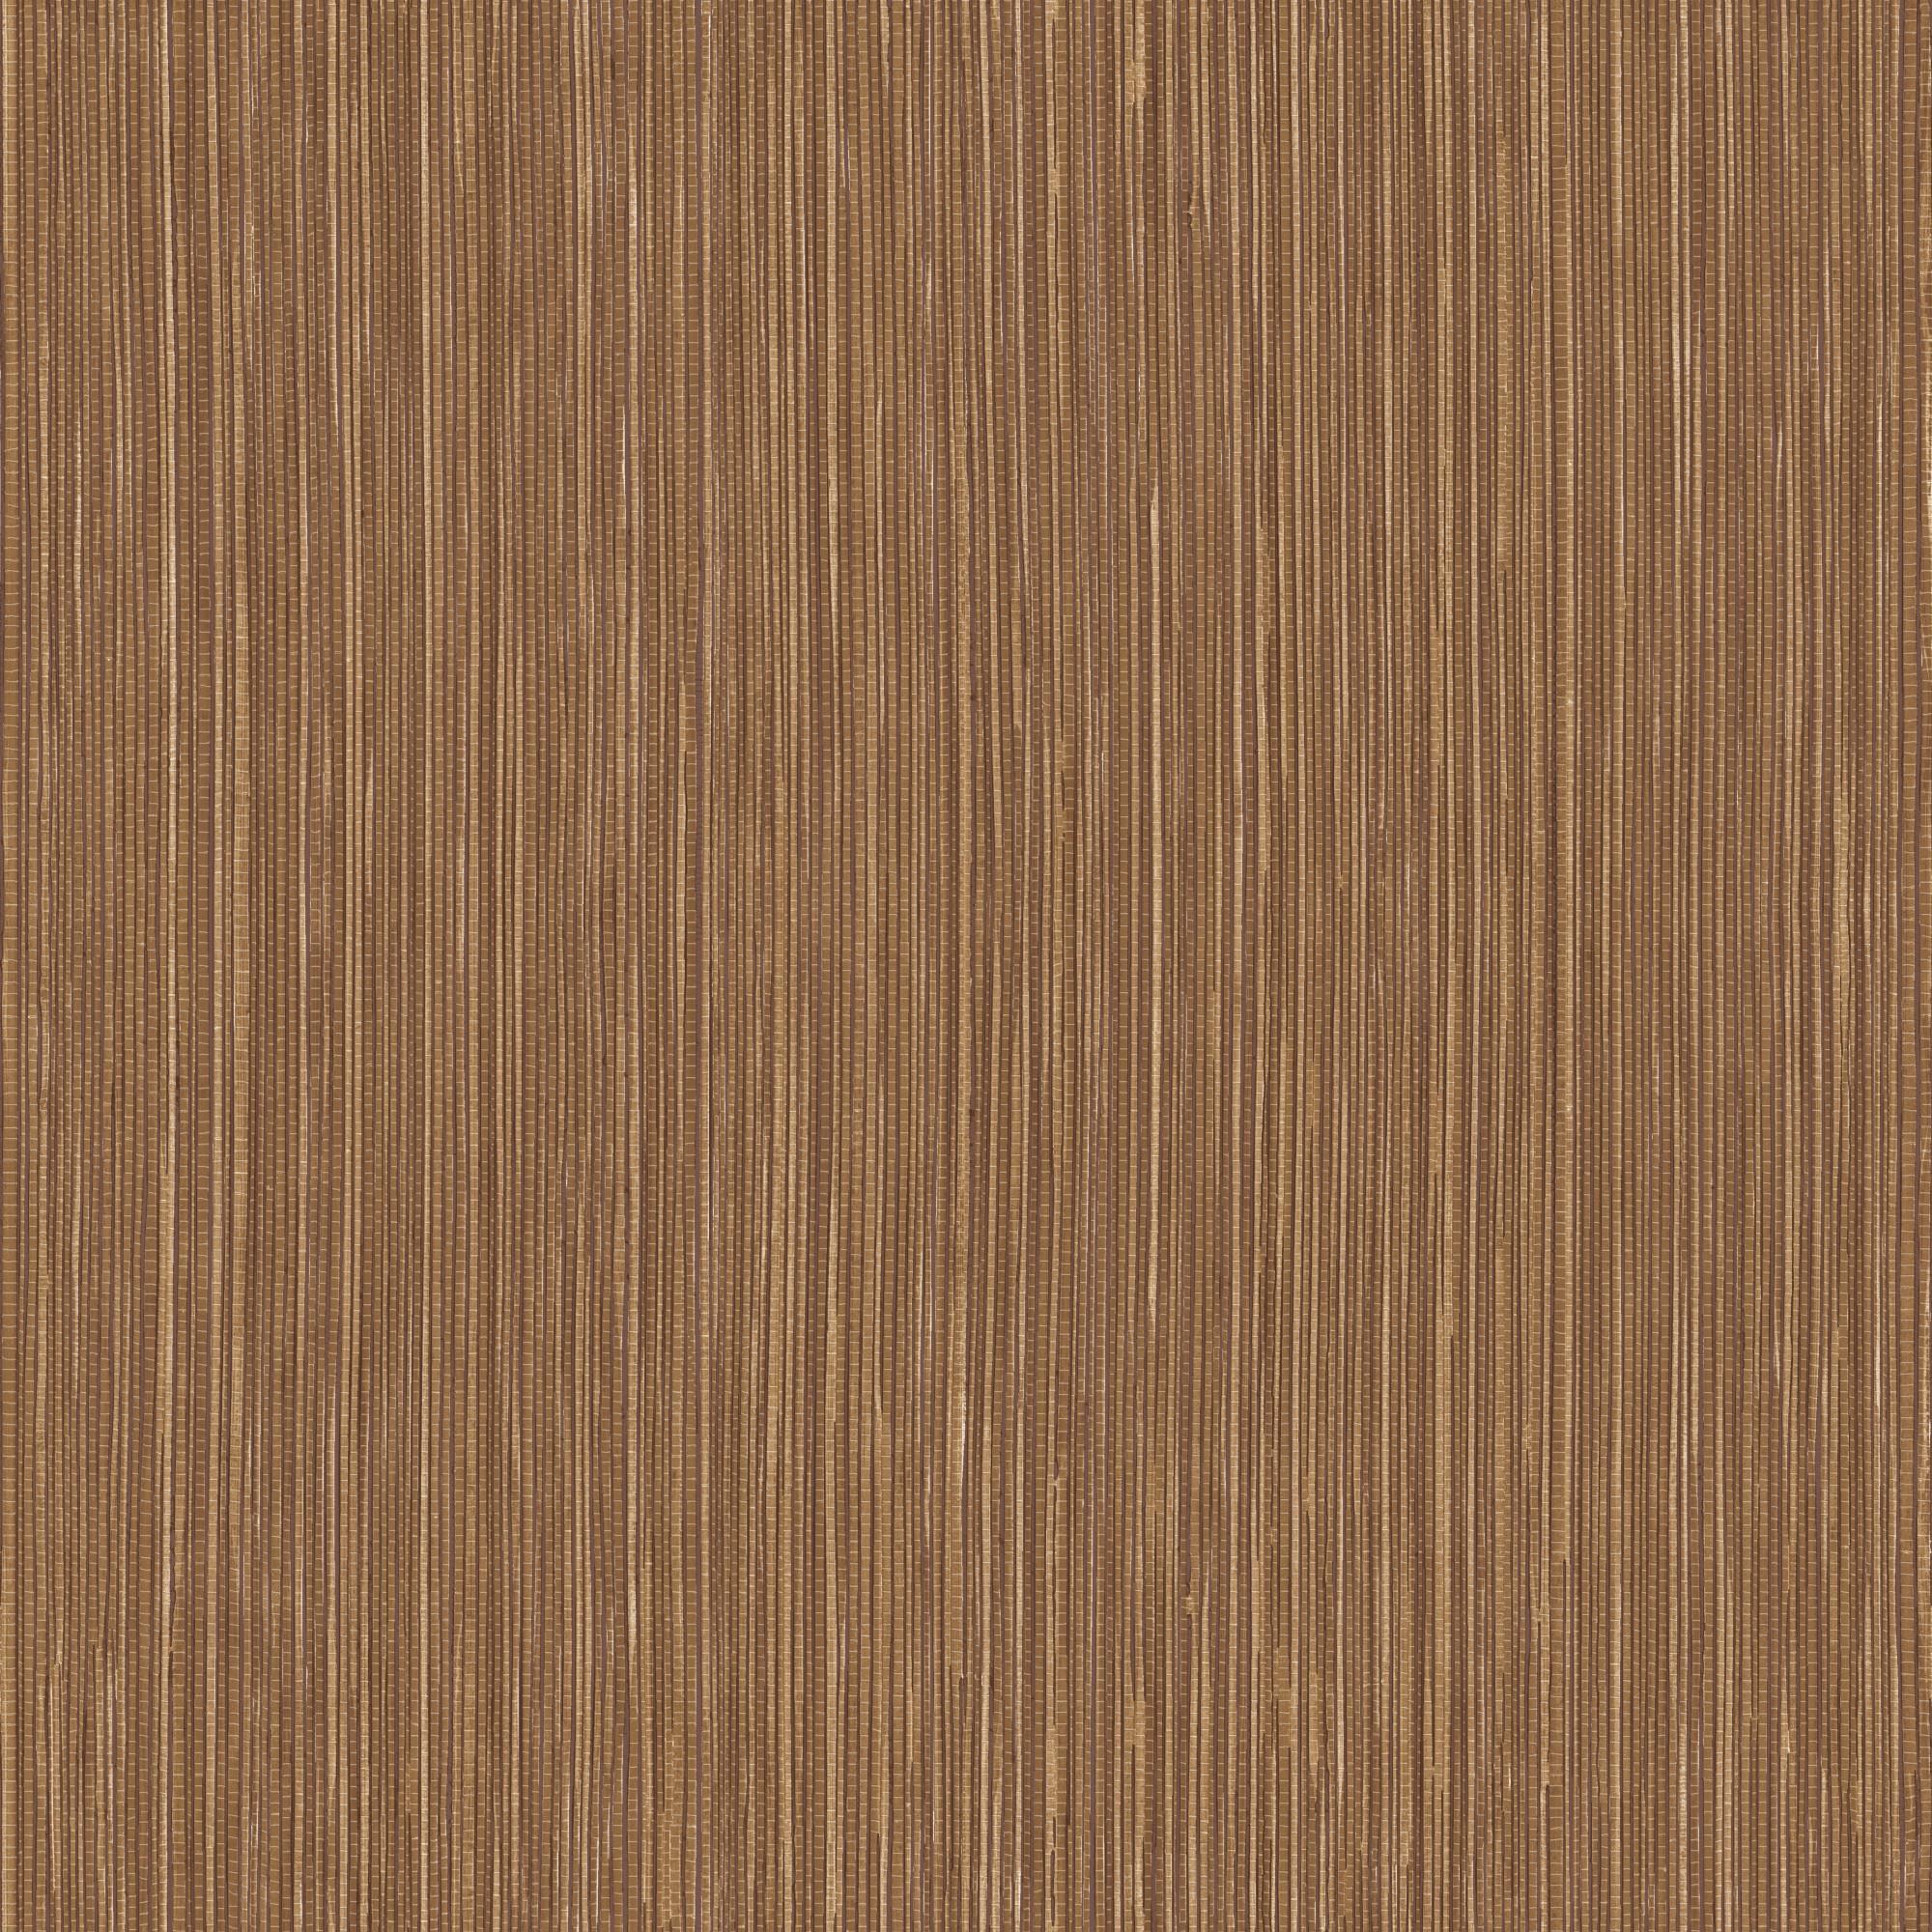 Papel de Parede 53cm x 10m Nonwoven Texturizado Blooming 0107 - Jolie